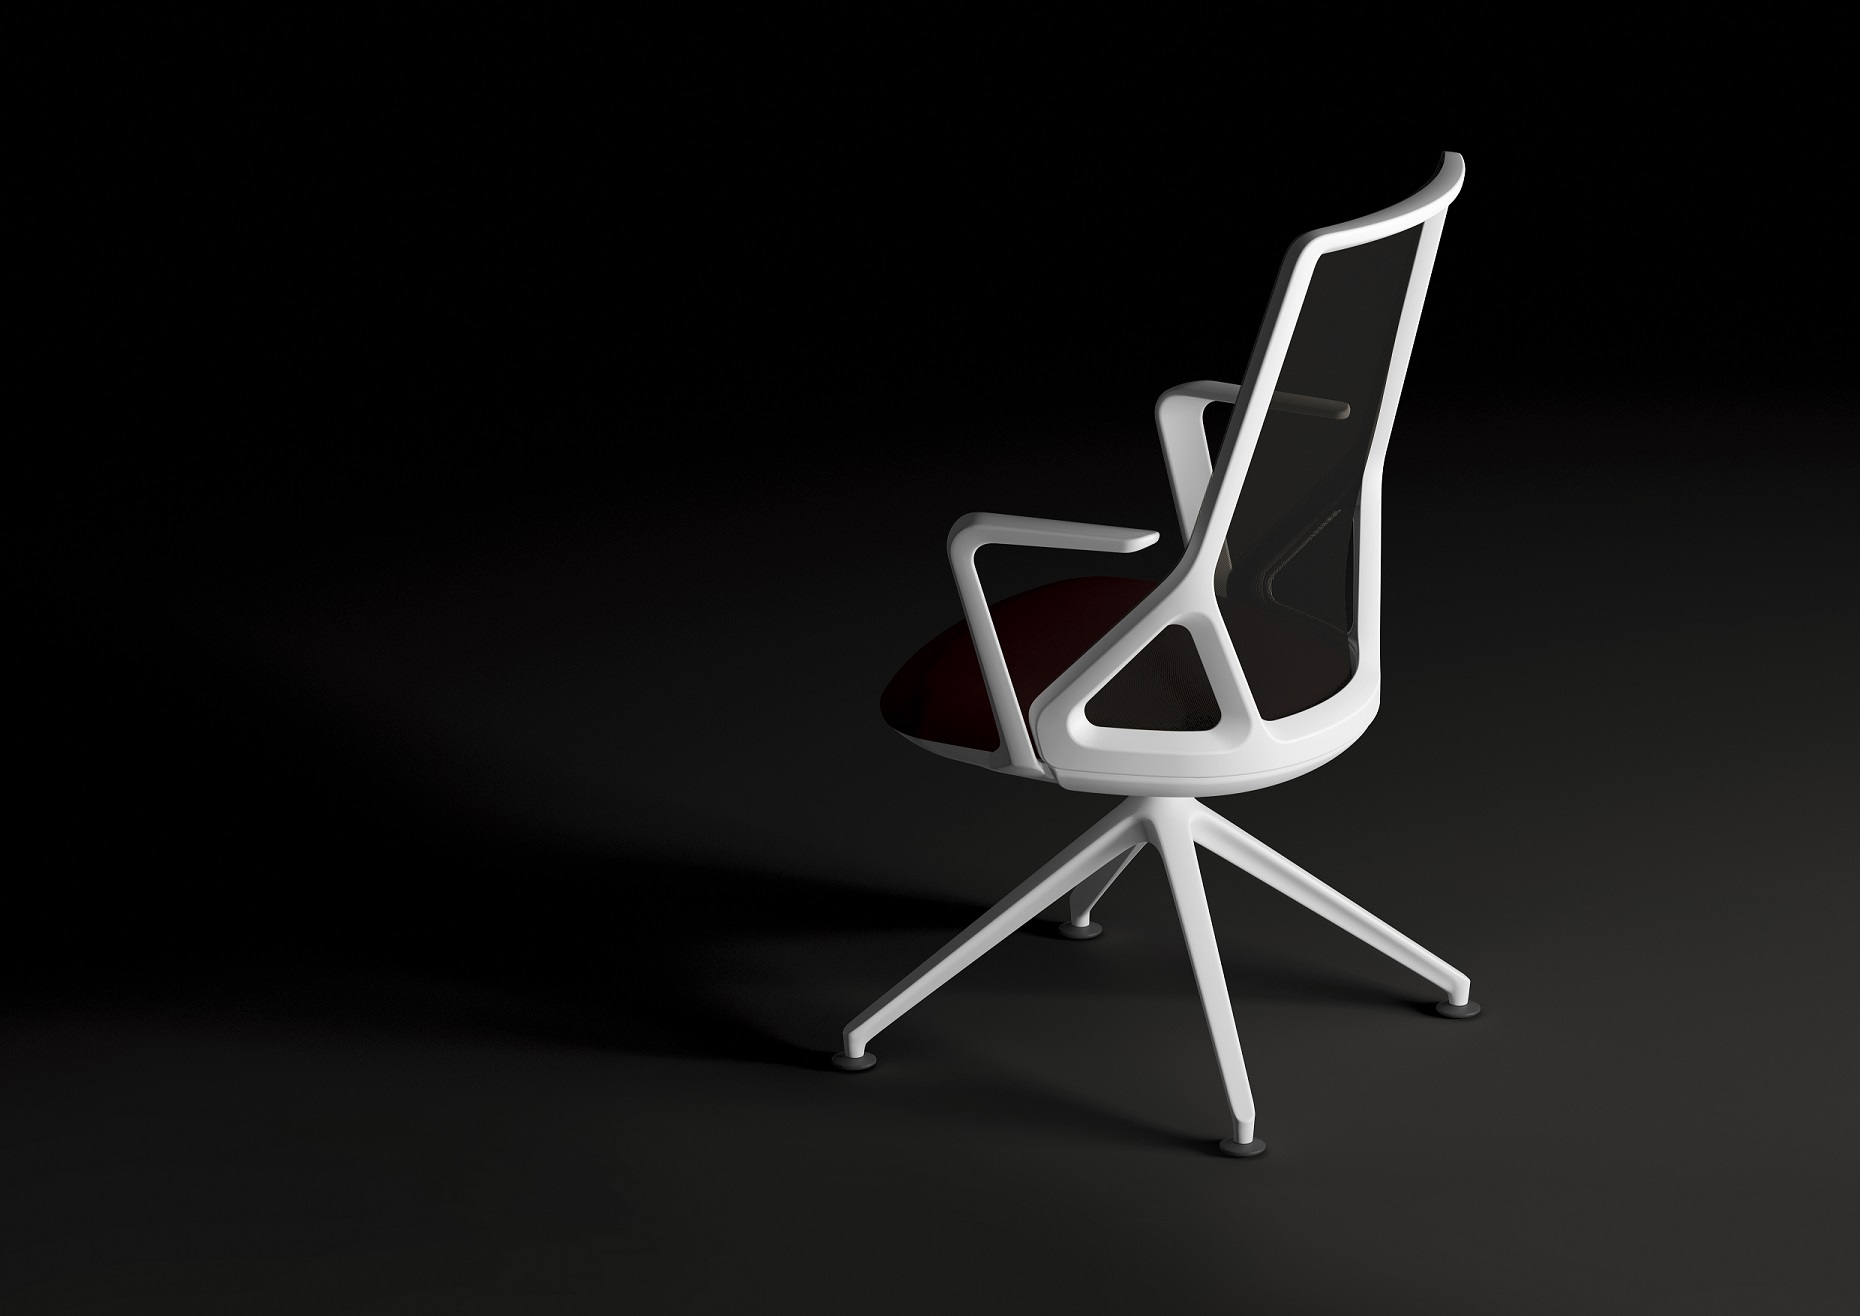 Cicero office chair